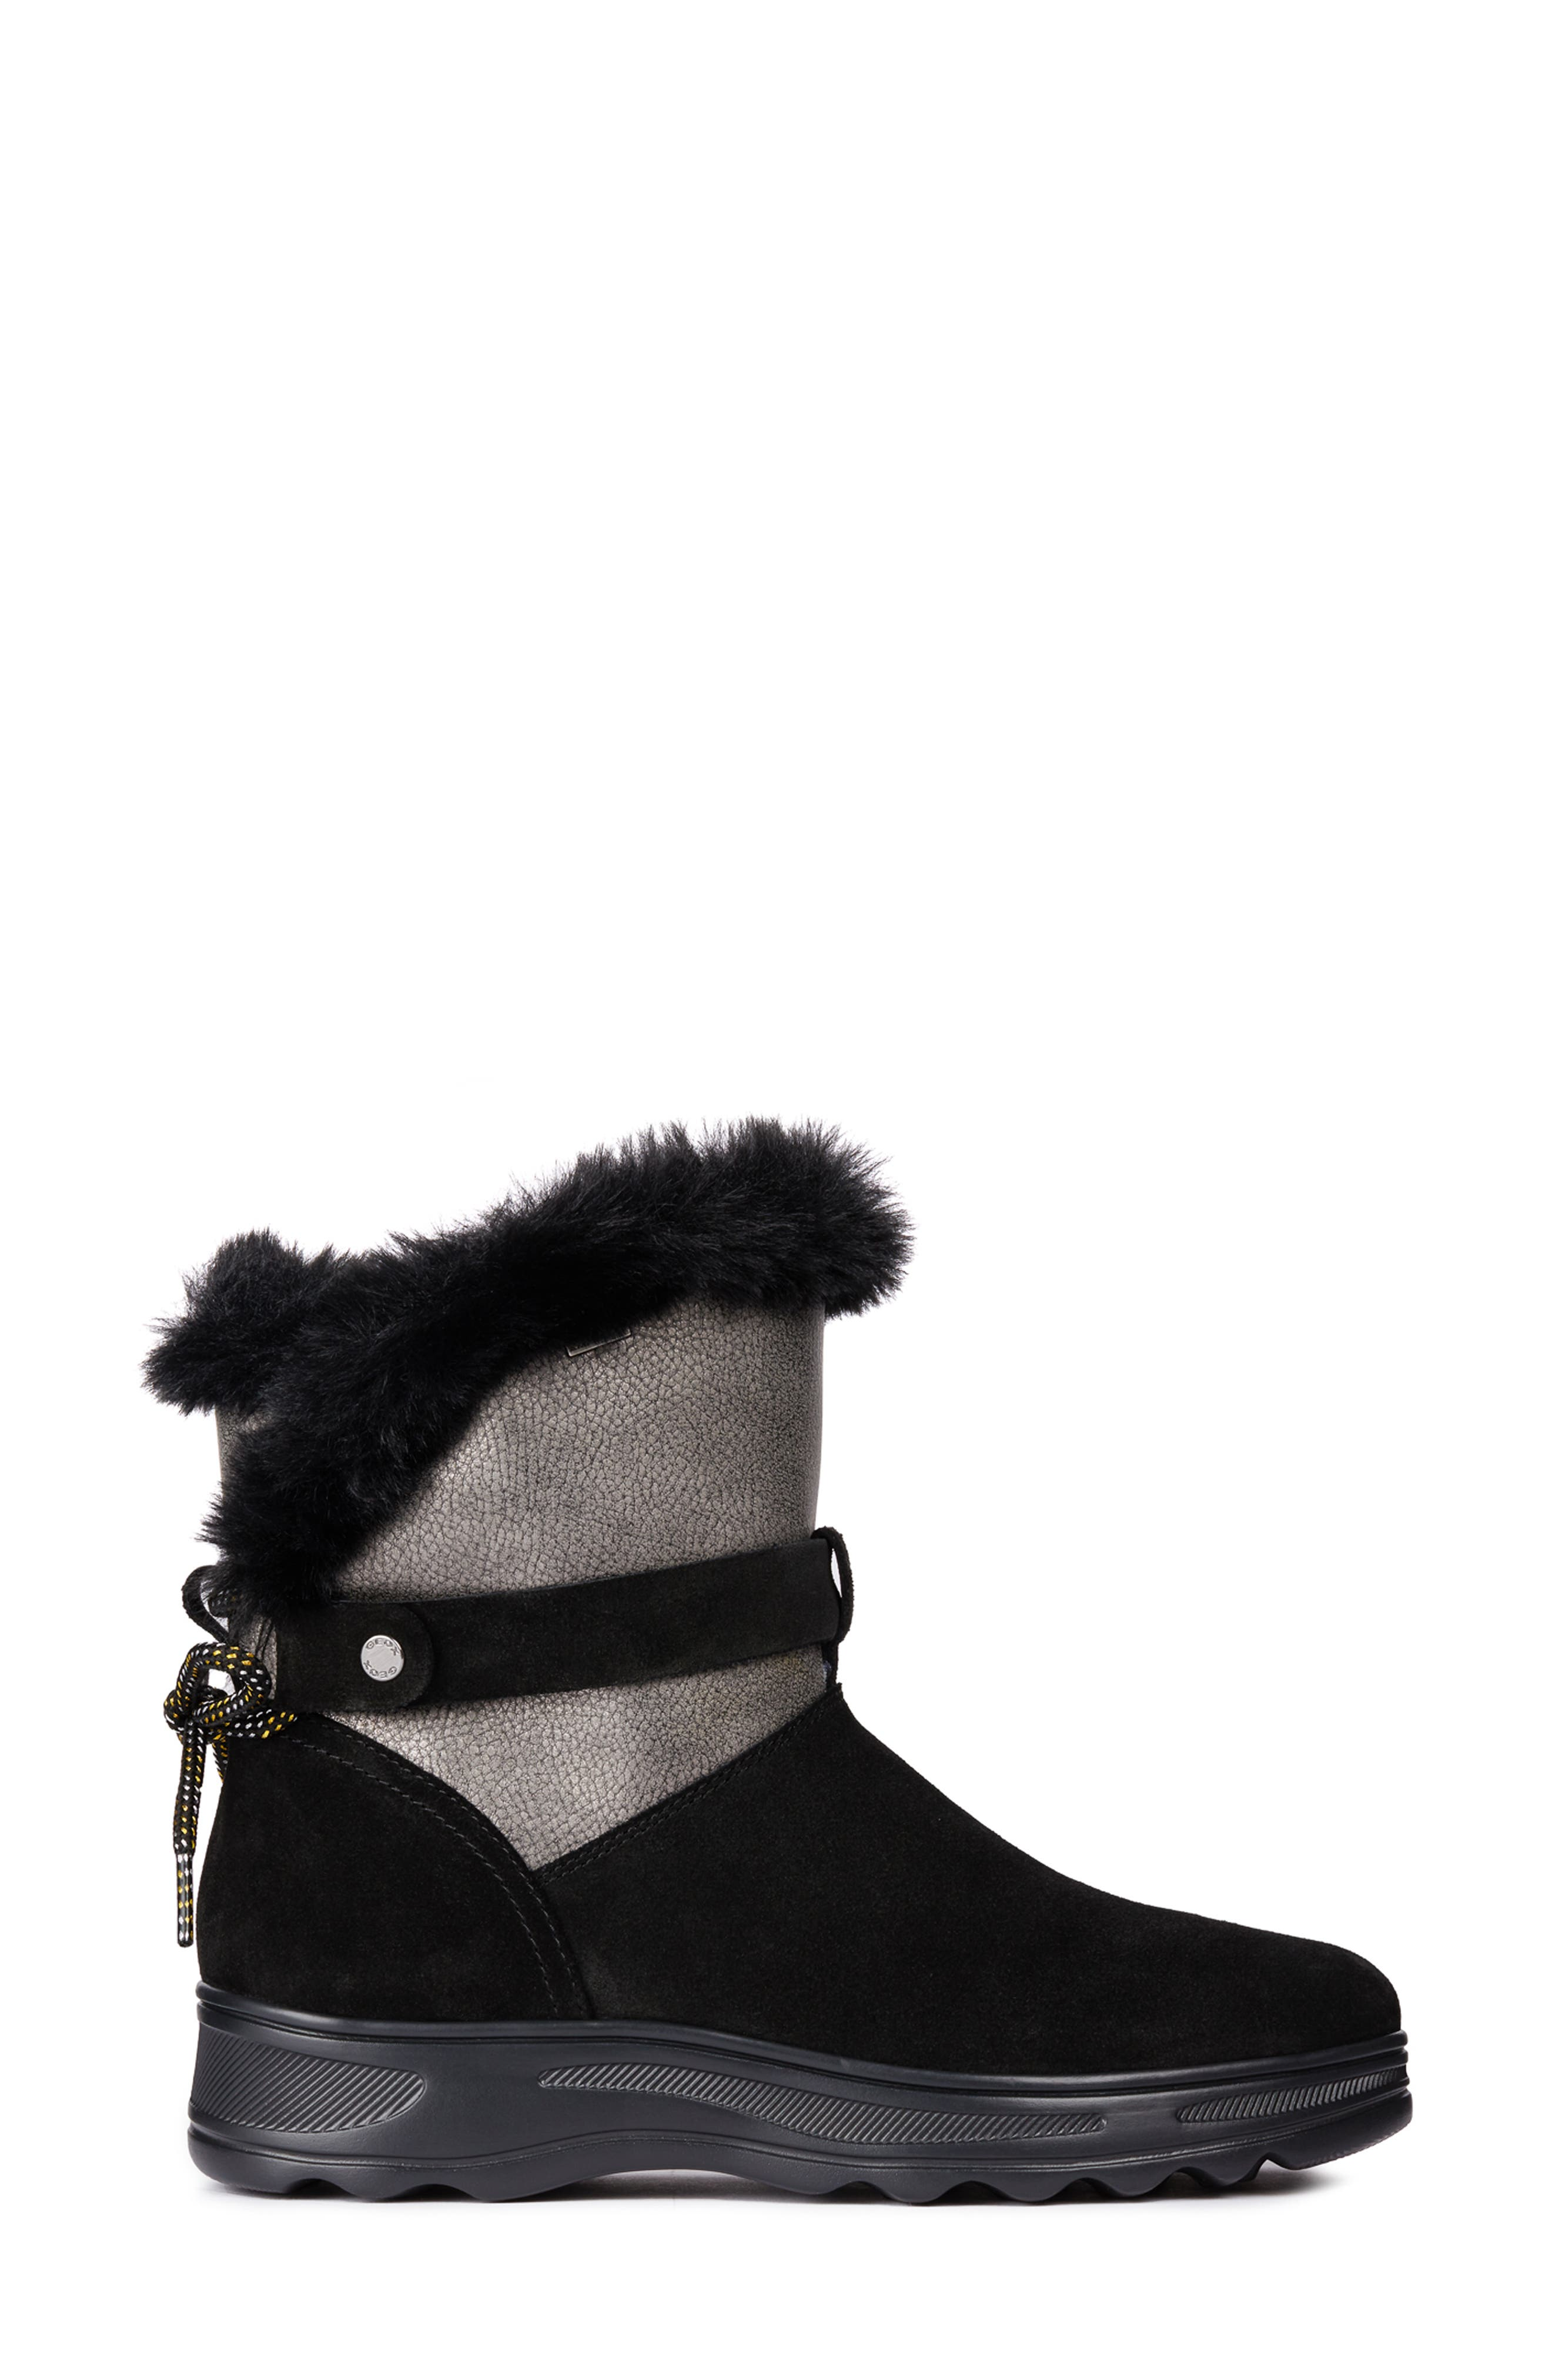 Hosmos ABX Waterproof Faux Fur Trim Boot,                             Alternate thumbnail 3, color,                             BLACK/ DARK GREY SUEDE